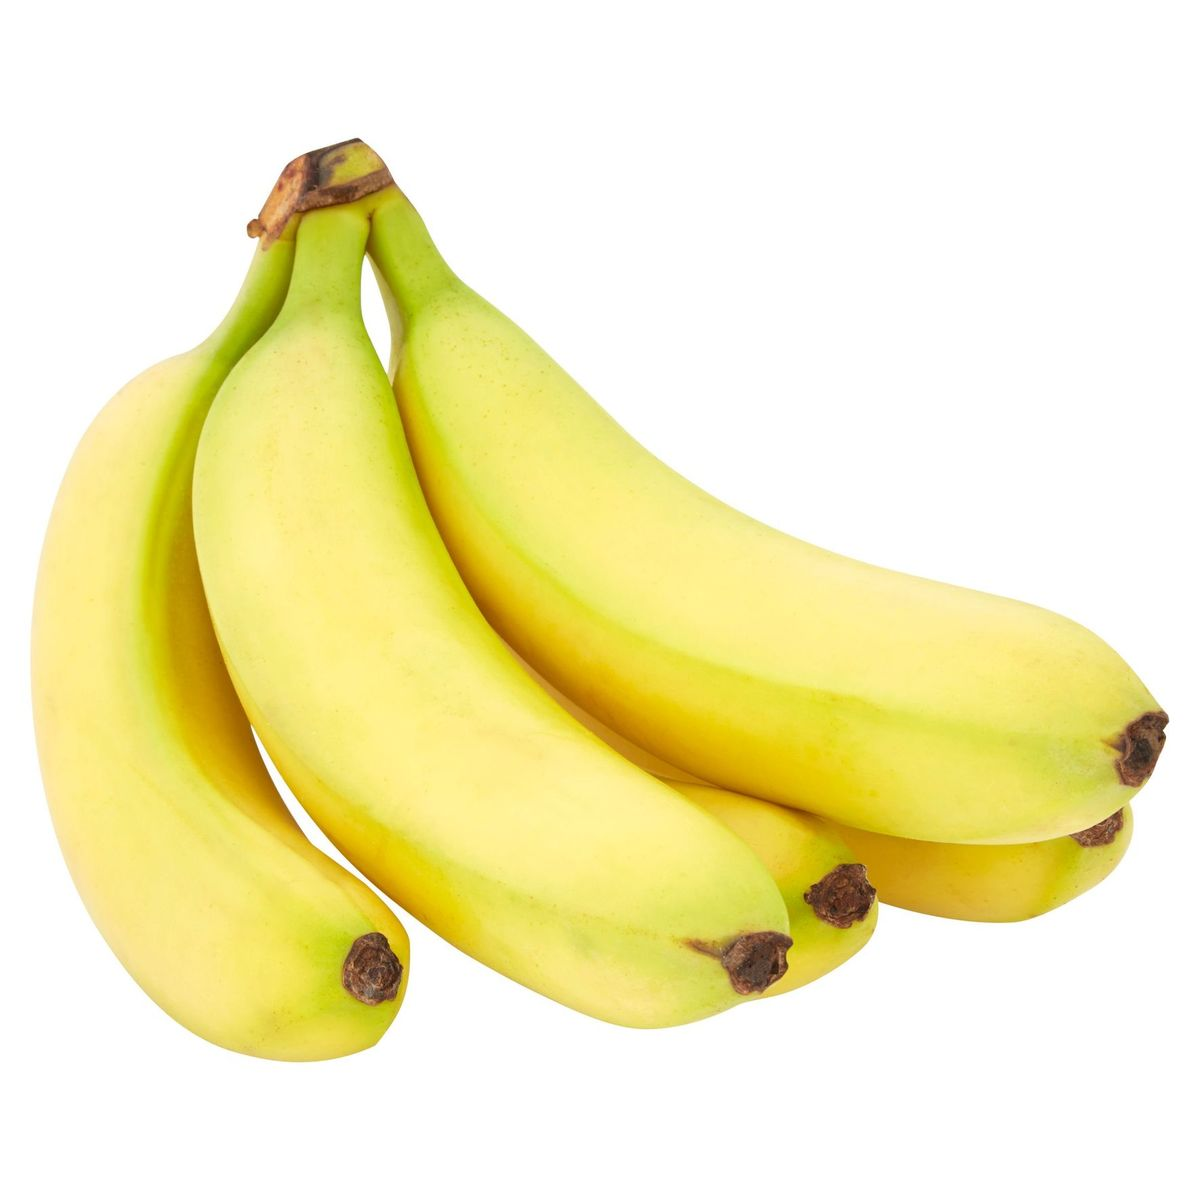 Bananes - 6 pièces